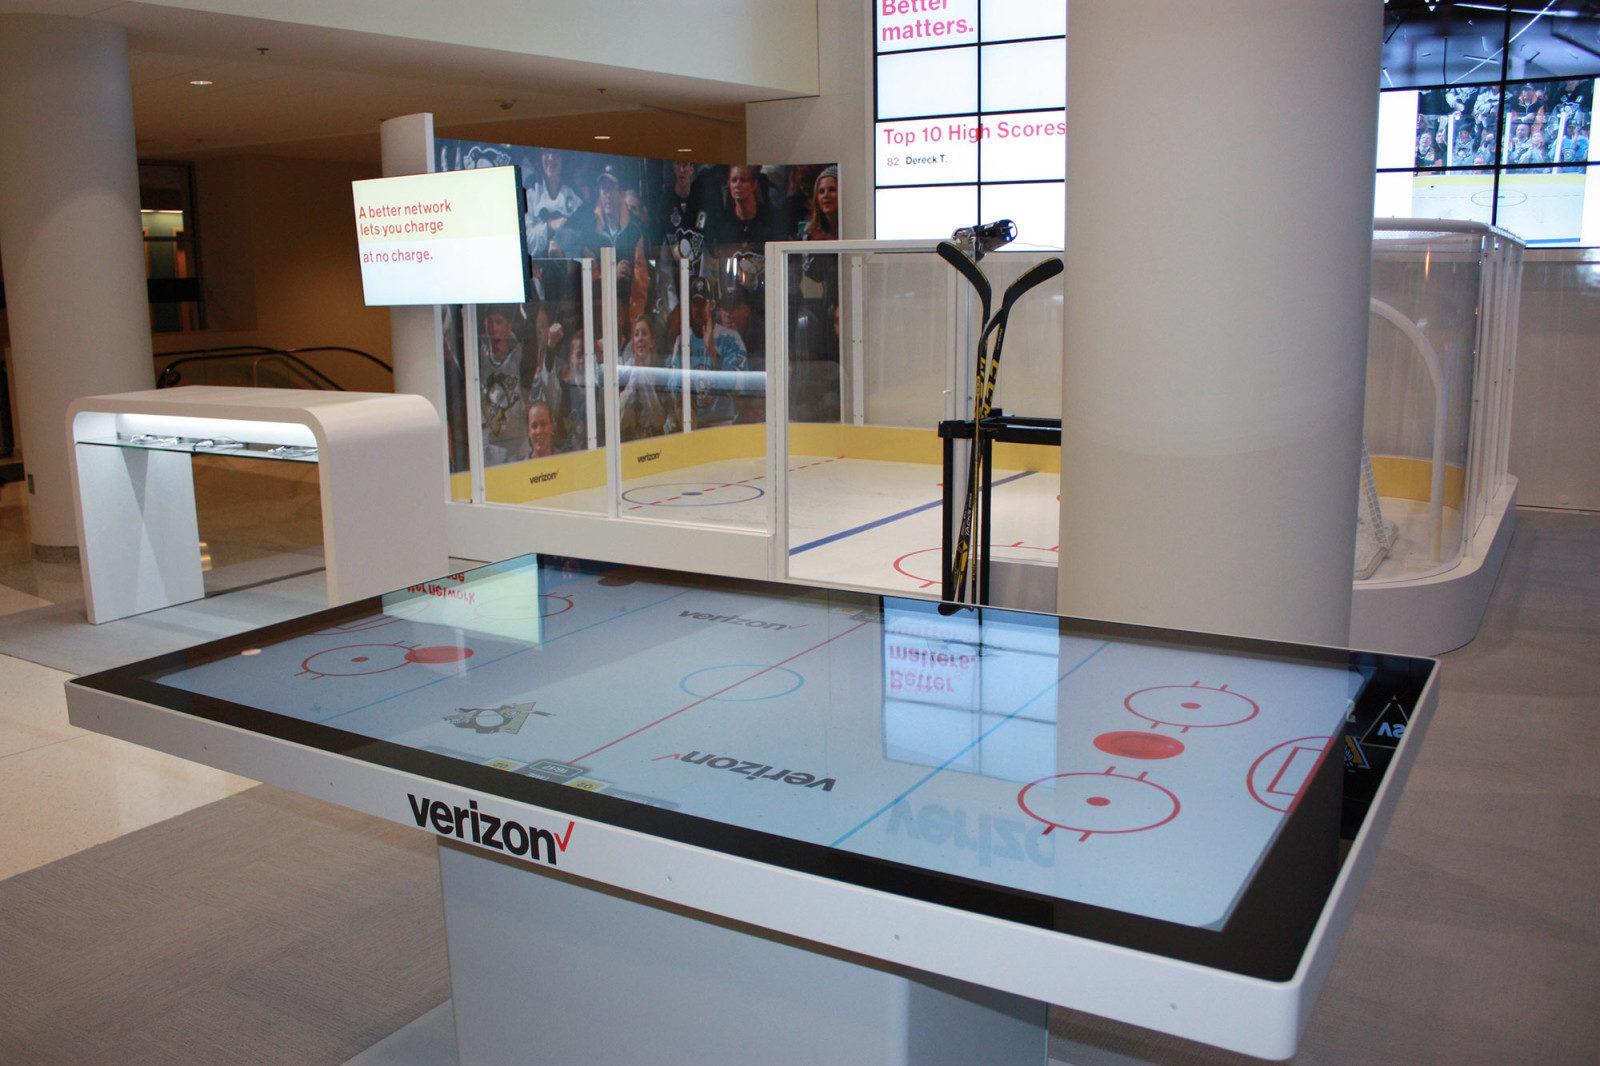 consol-energy-air-hockey-1600x1066